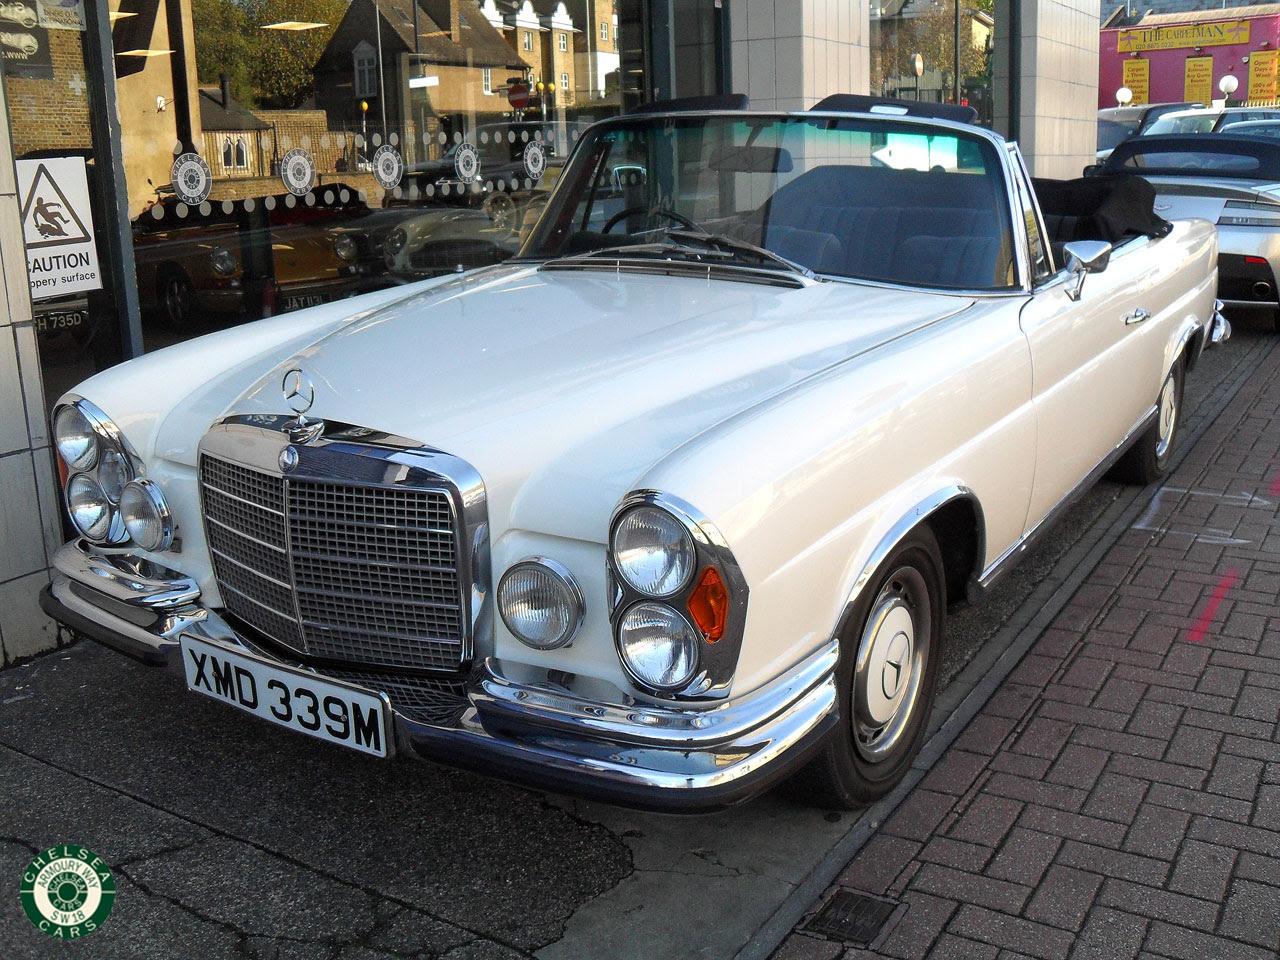 1974 Mercedes 280 SE 3.5 Cabriolet For Sale | Chelsea Cars